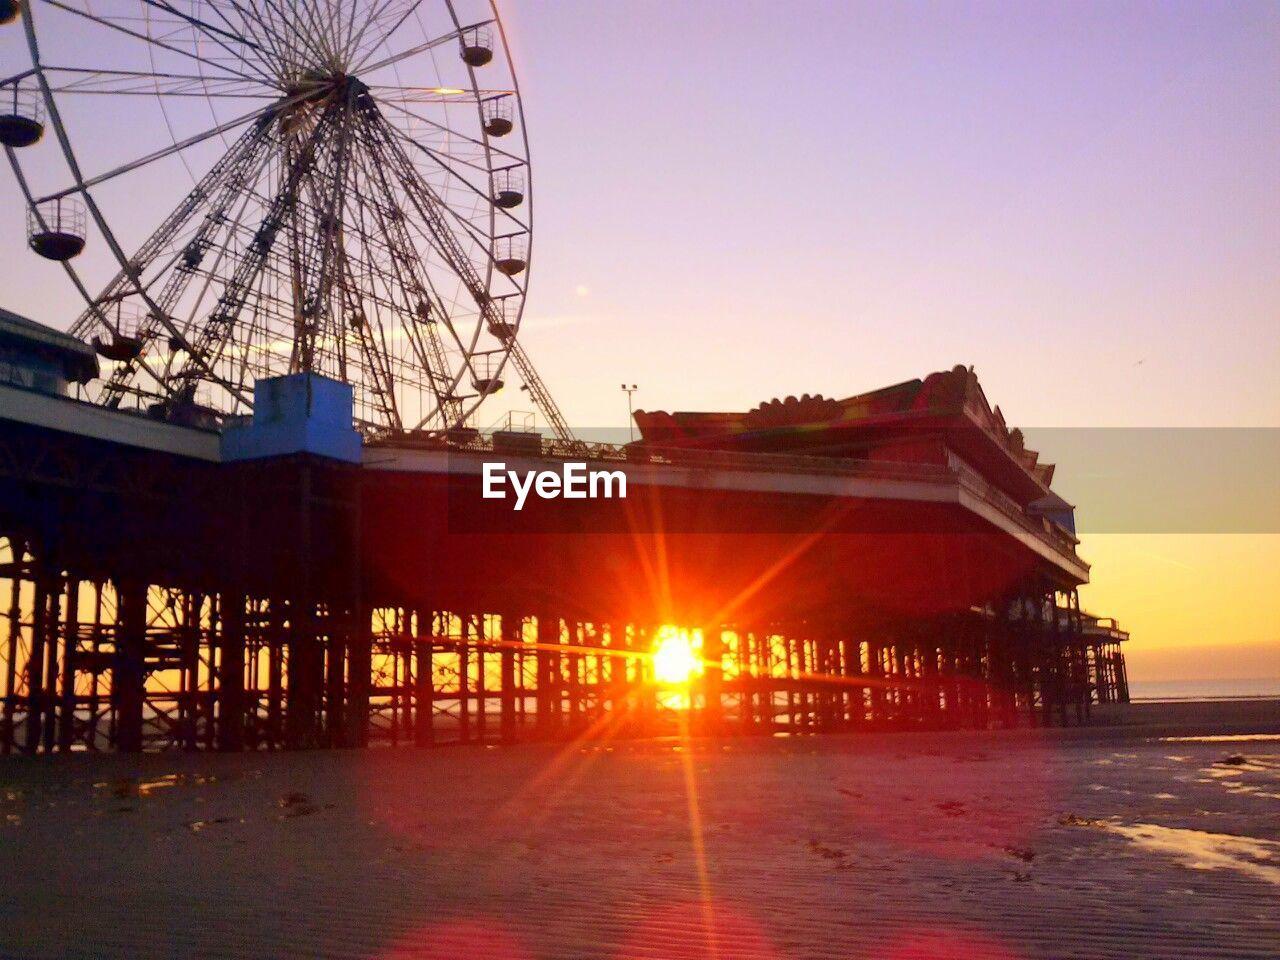 sunset, lens flare, amusement park, sun, outdoors, ferris wheel, clear sky, no people, sunlight, sky, amusement park ride, built structure, arts culture and entertainment, nature, architecture, sea, day